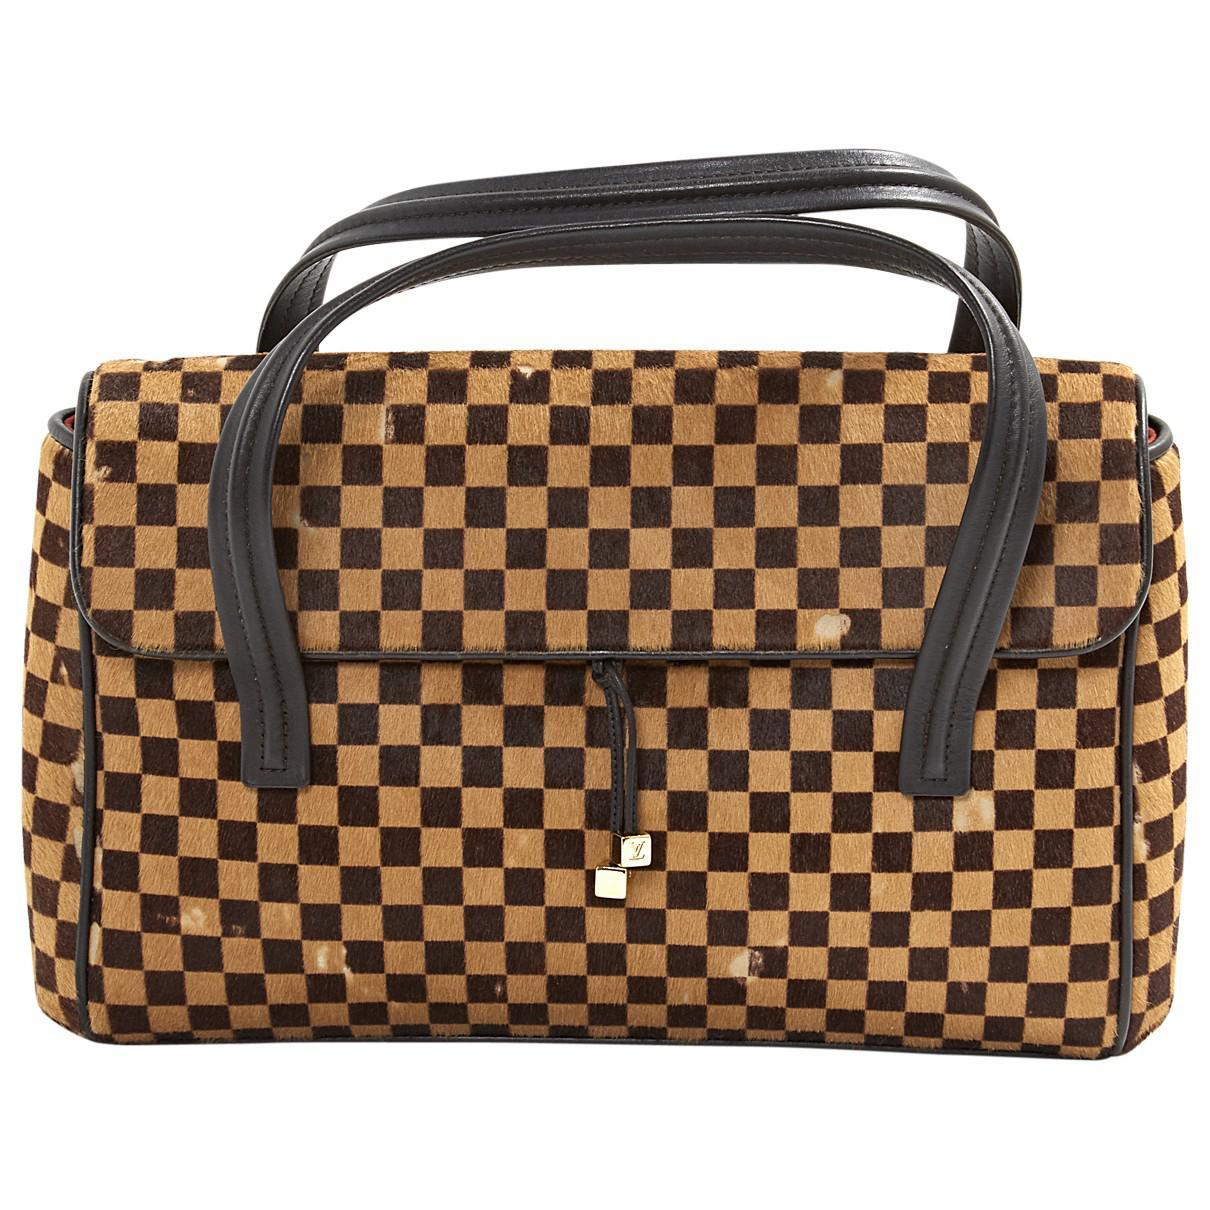 Dolce & Gabbana Pre-owned - Pony-style calfskin handbag vS8BtZ6H05